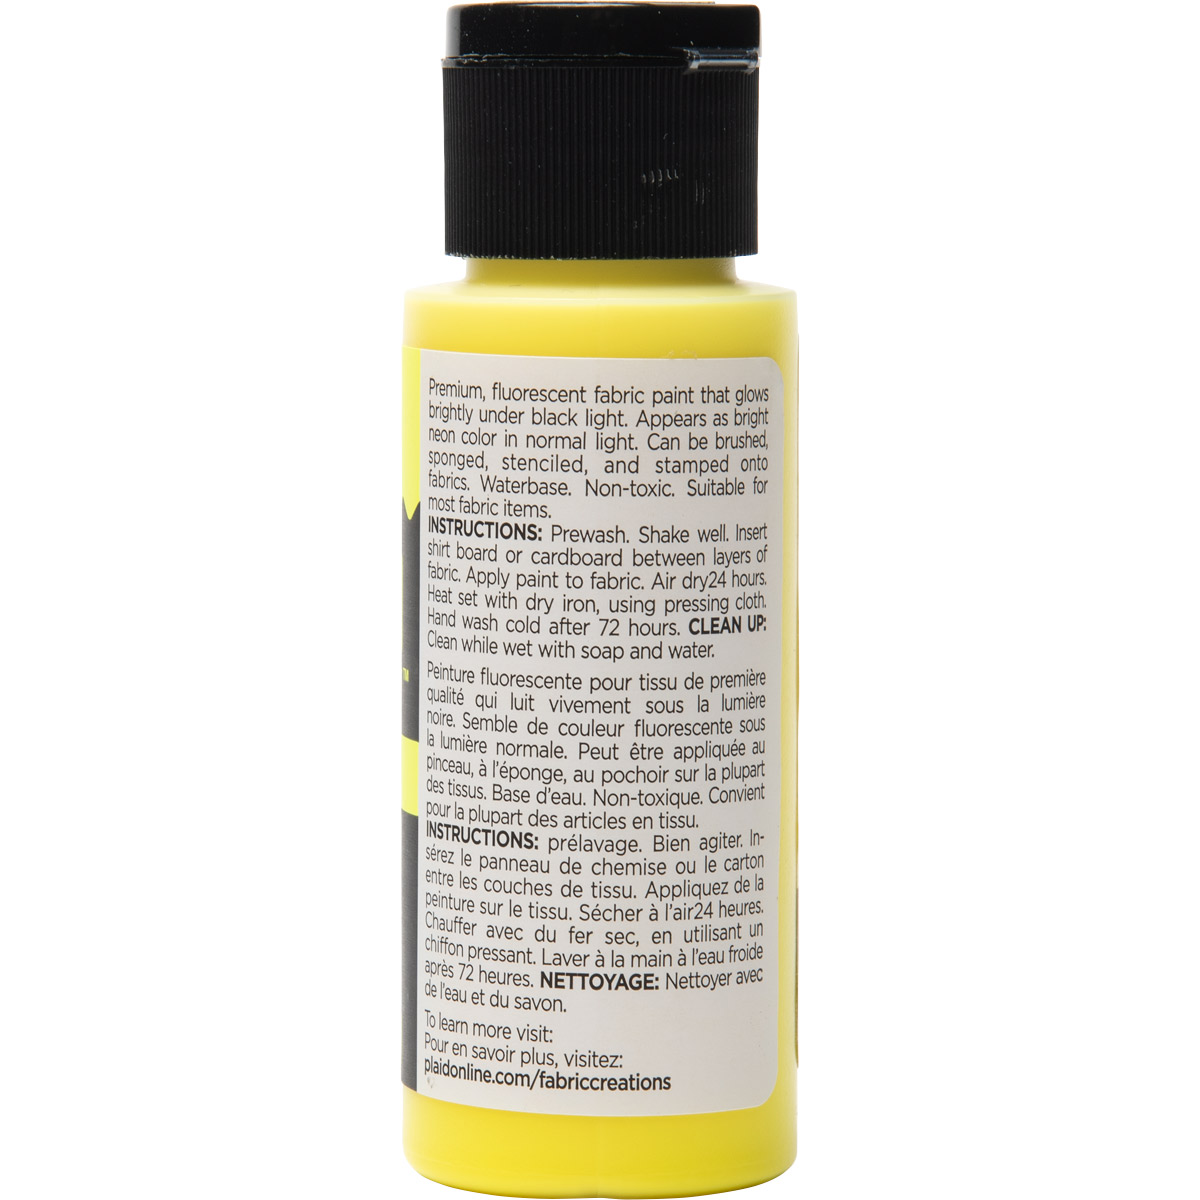 Fabric Creations™ Neon Black Light Fabric Paint - Yellow, 2 oz. - 44661